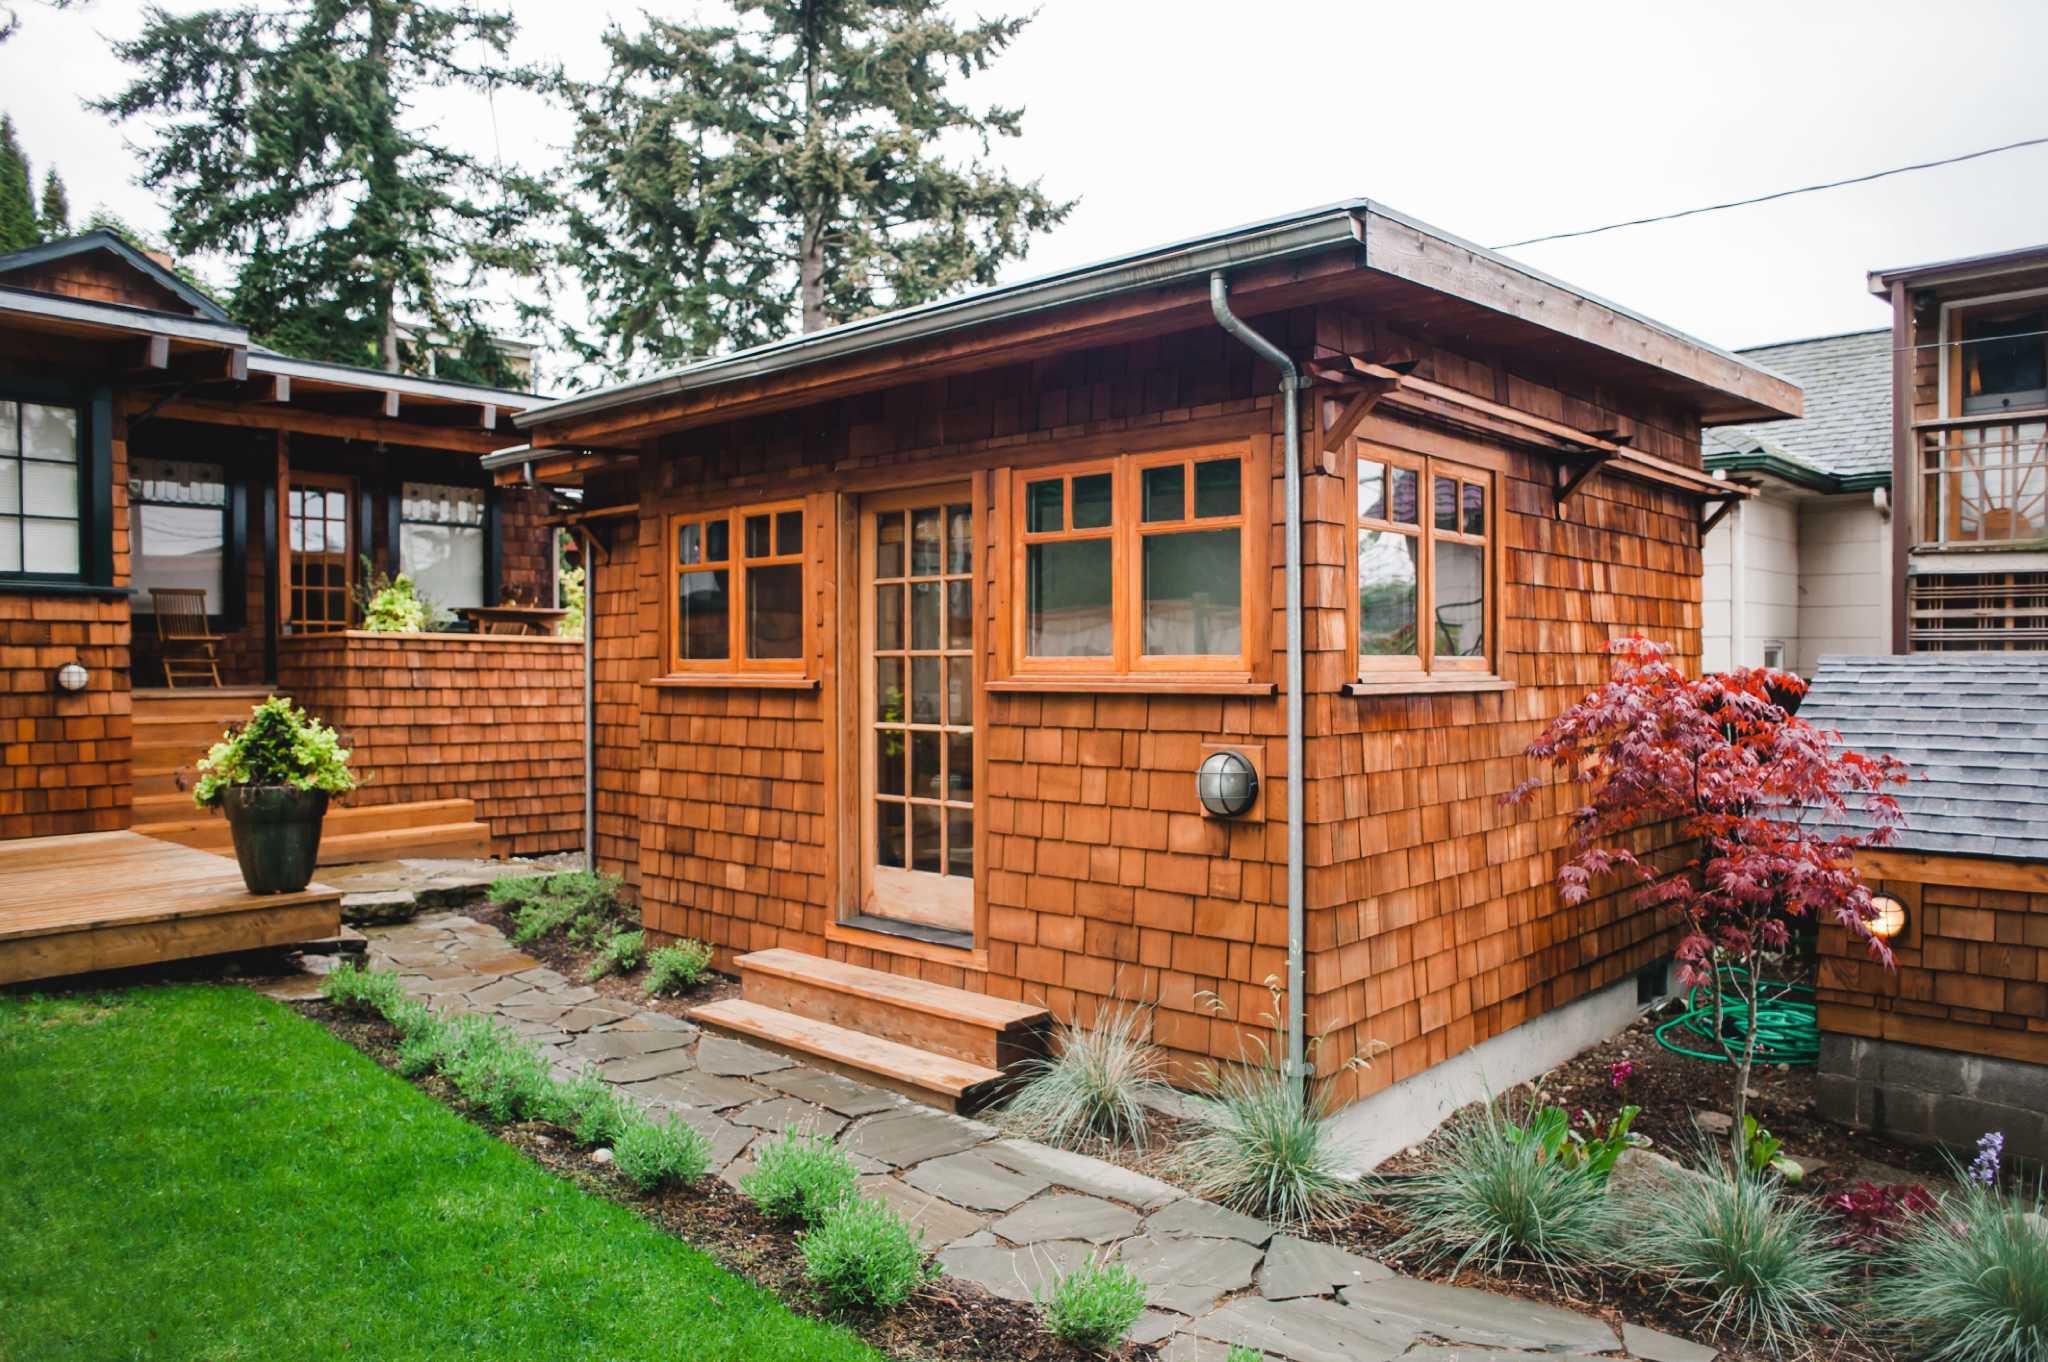 Seattle Backyard Cottage Guide : Unique Airbnb spots in Seattle  seattlepicom